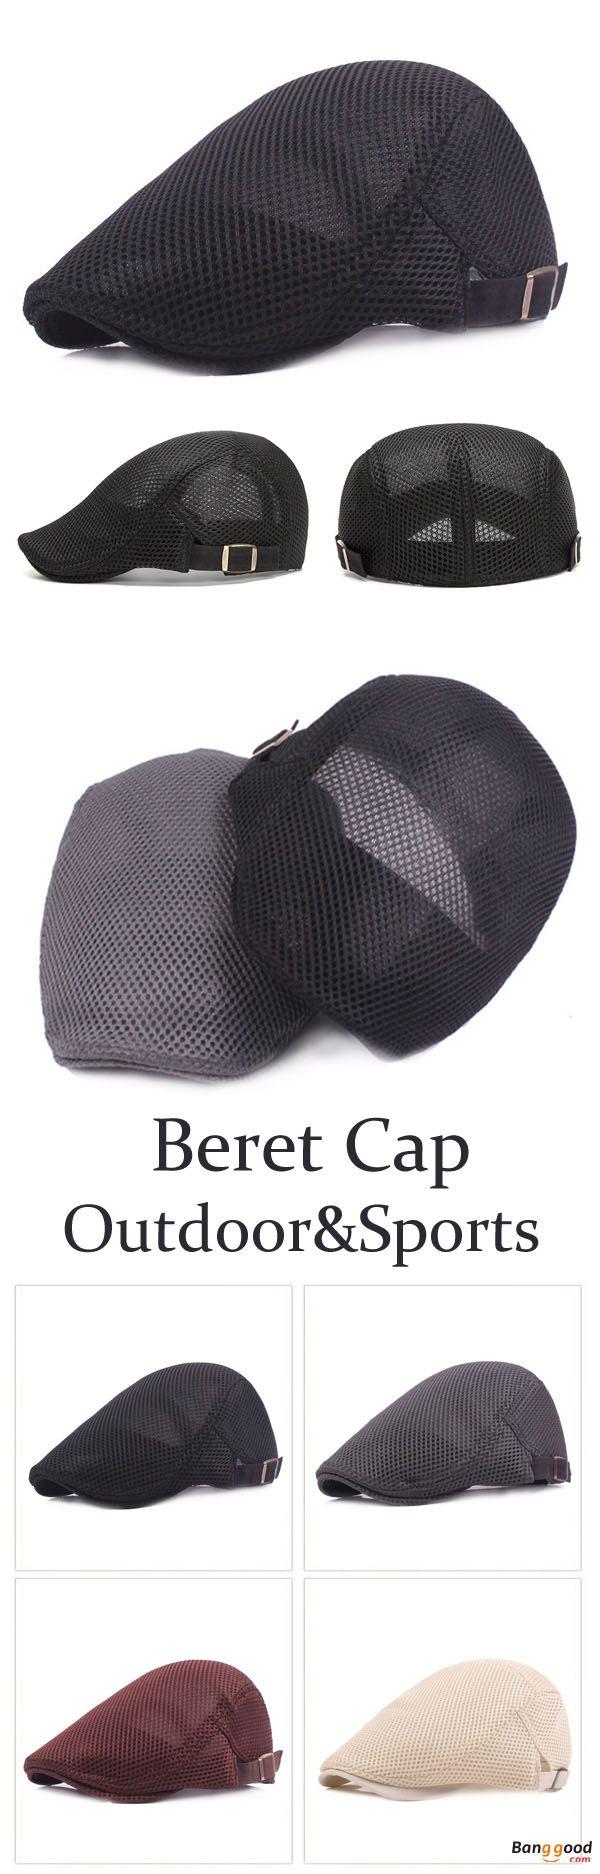 US$7.99+Free shipping. Men's Cap, Men's Fashion, Beret Hat, Golf Hat, Baseball Hat, Cabbie Hat. Adjustable, Breathable. Color: White, Black, Brown, Beige, Grey.